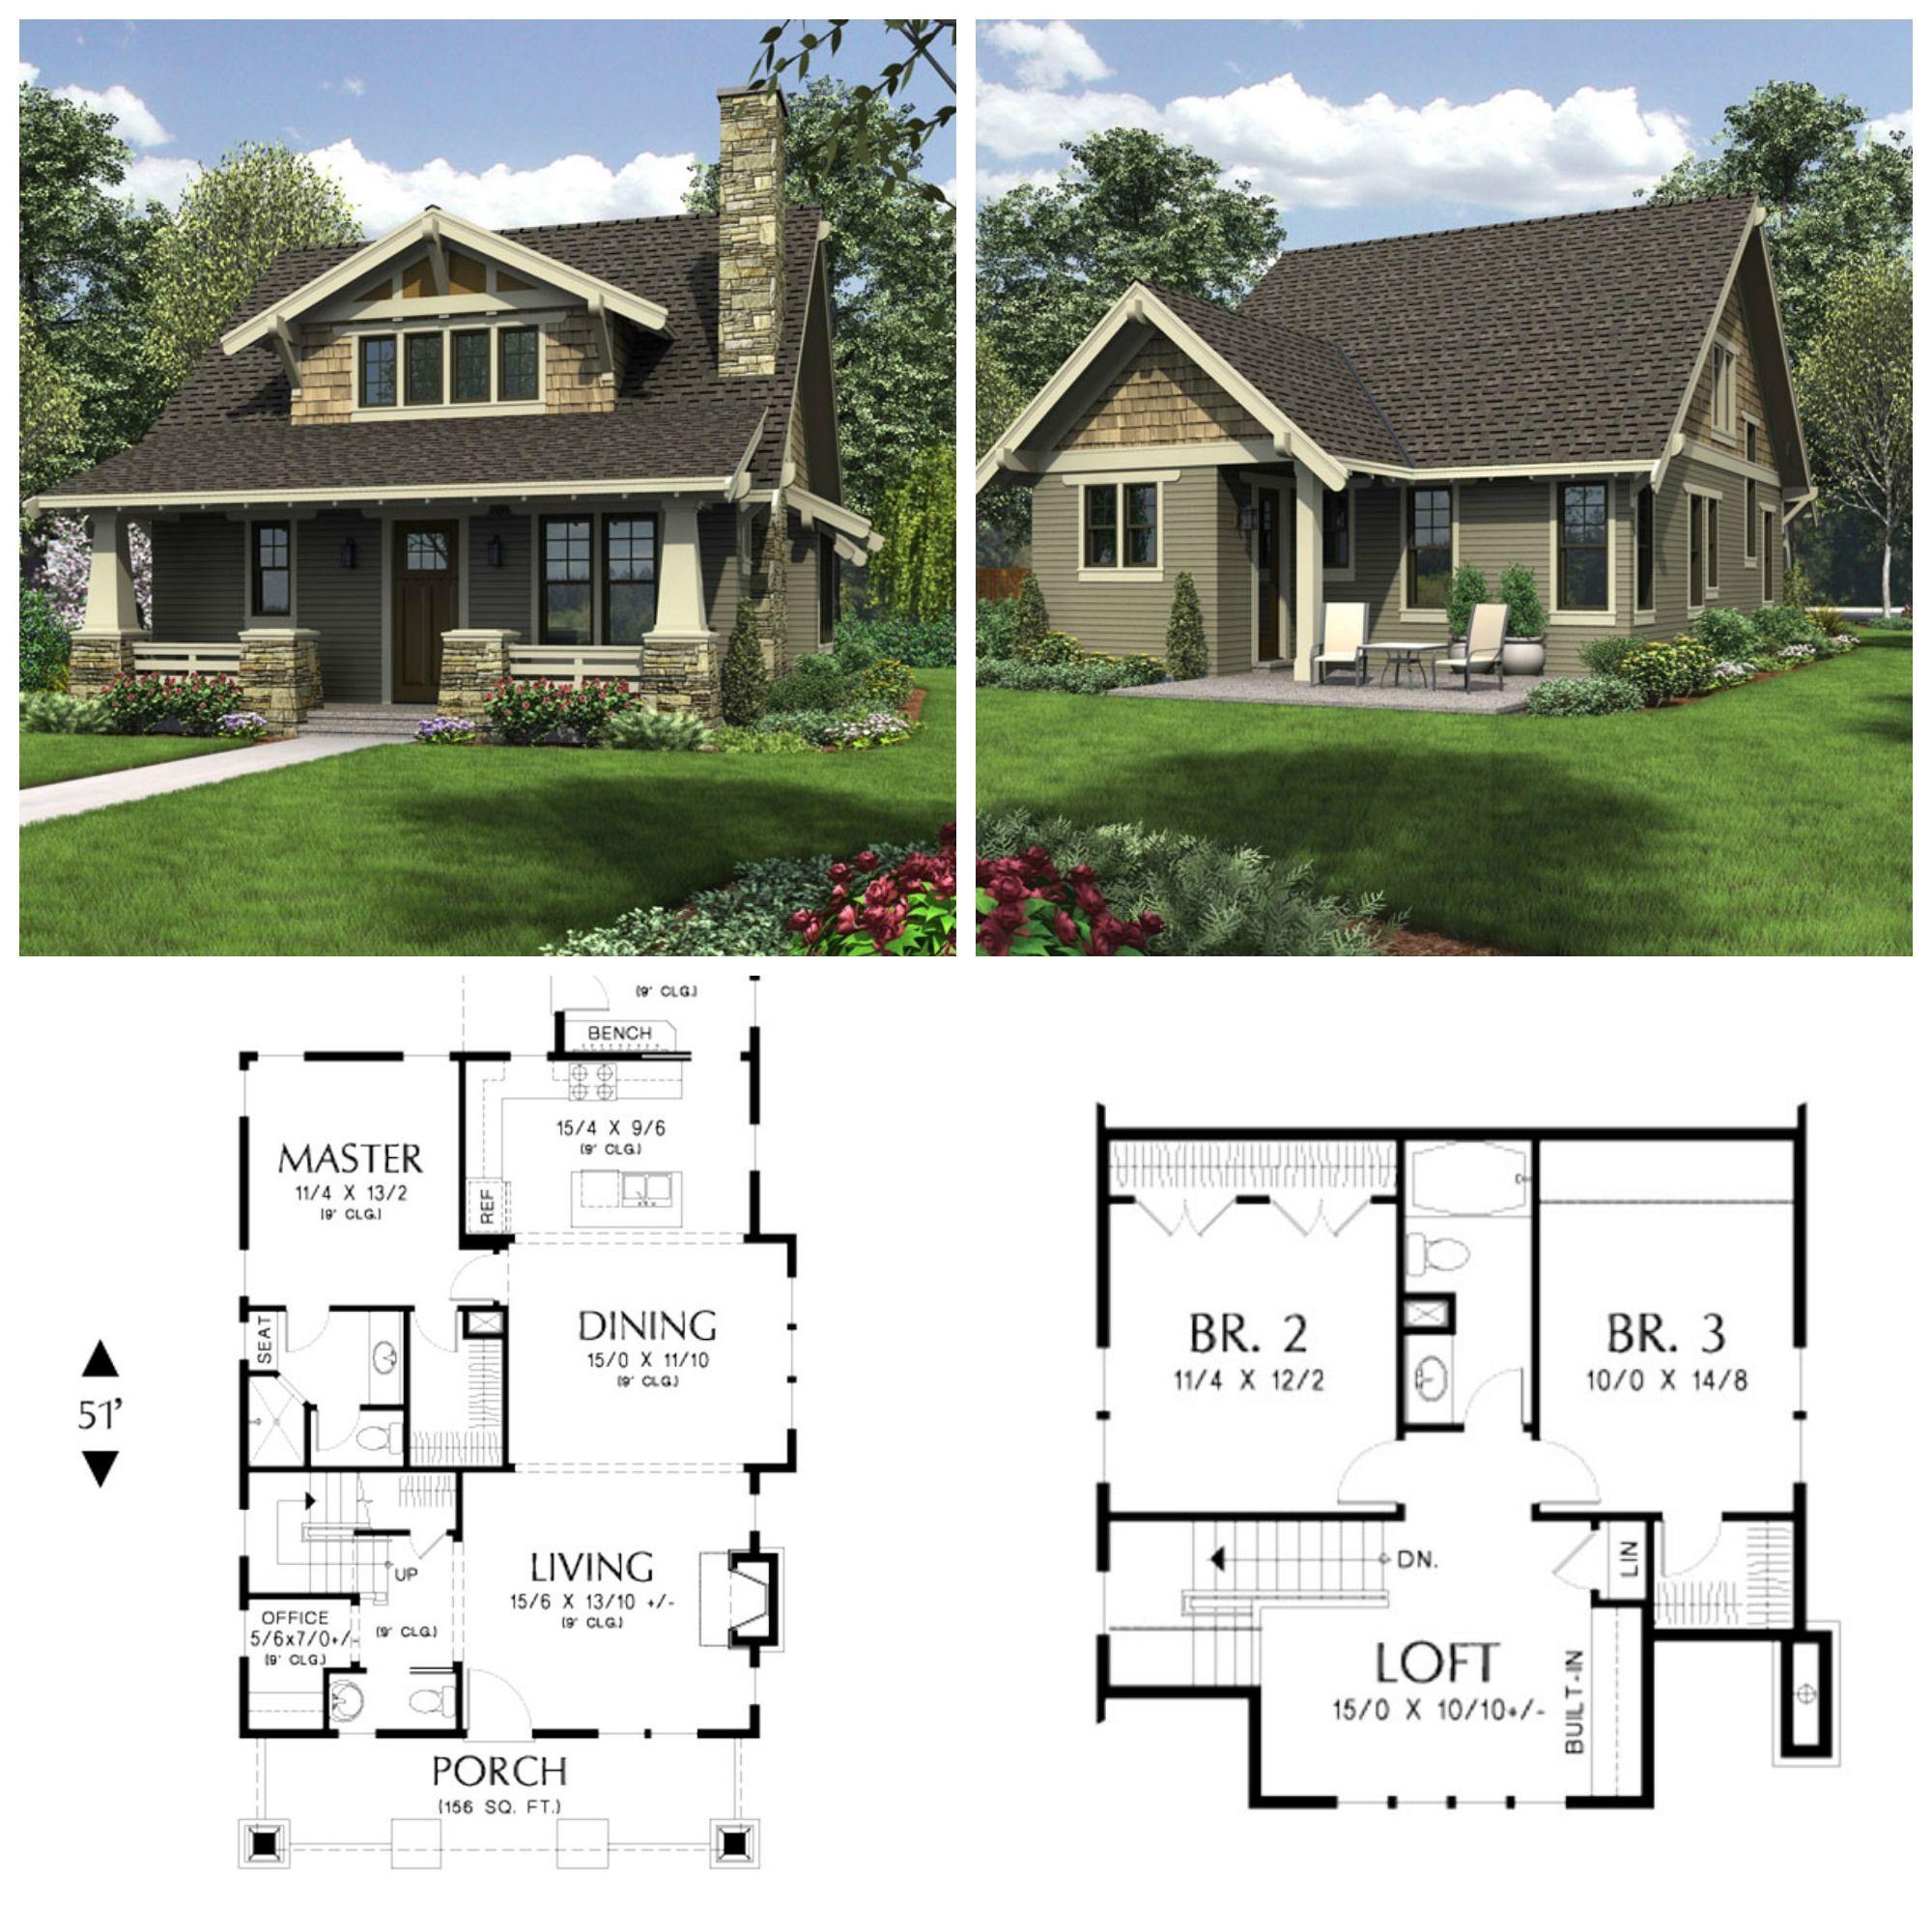 Bungalow House Plans 3 Bedrooms No Garage In 2020 Bungalow Style House Plans Small Cottage House Plans Bungalow House Plans